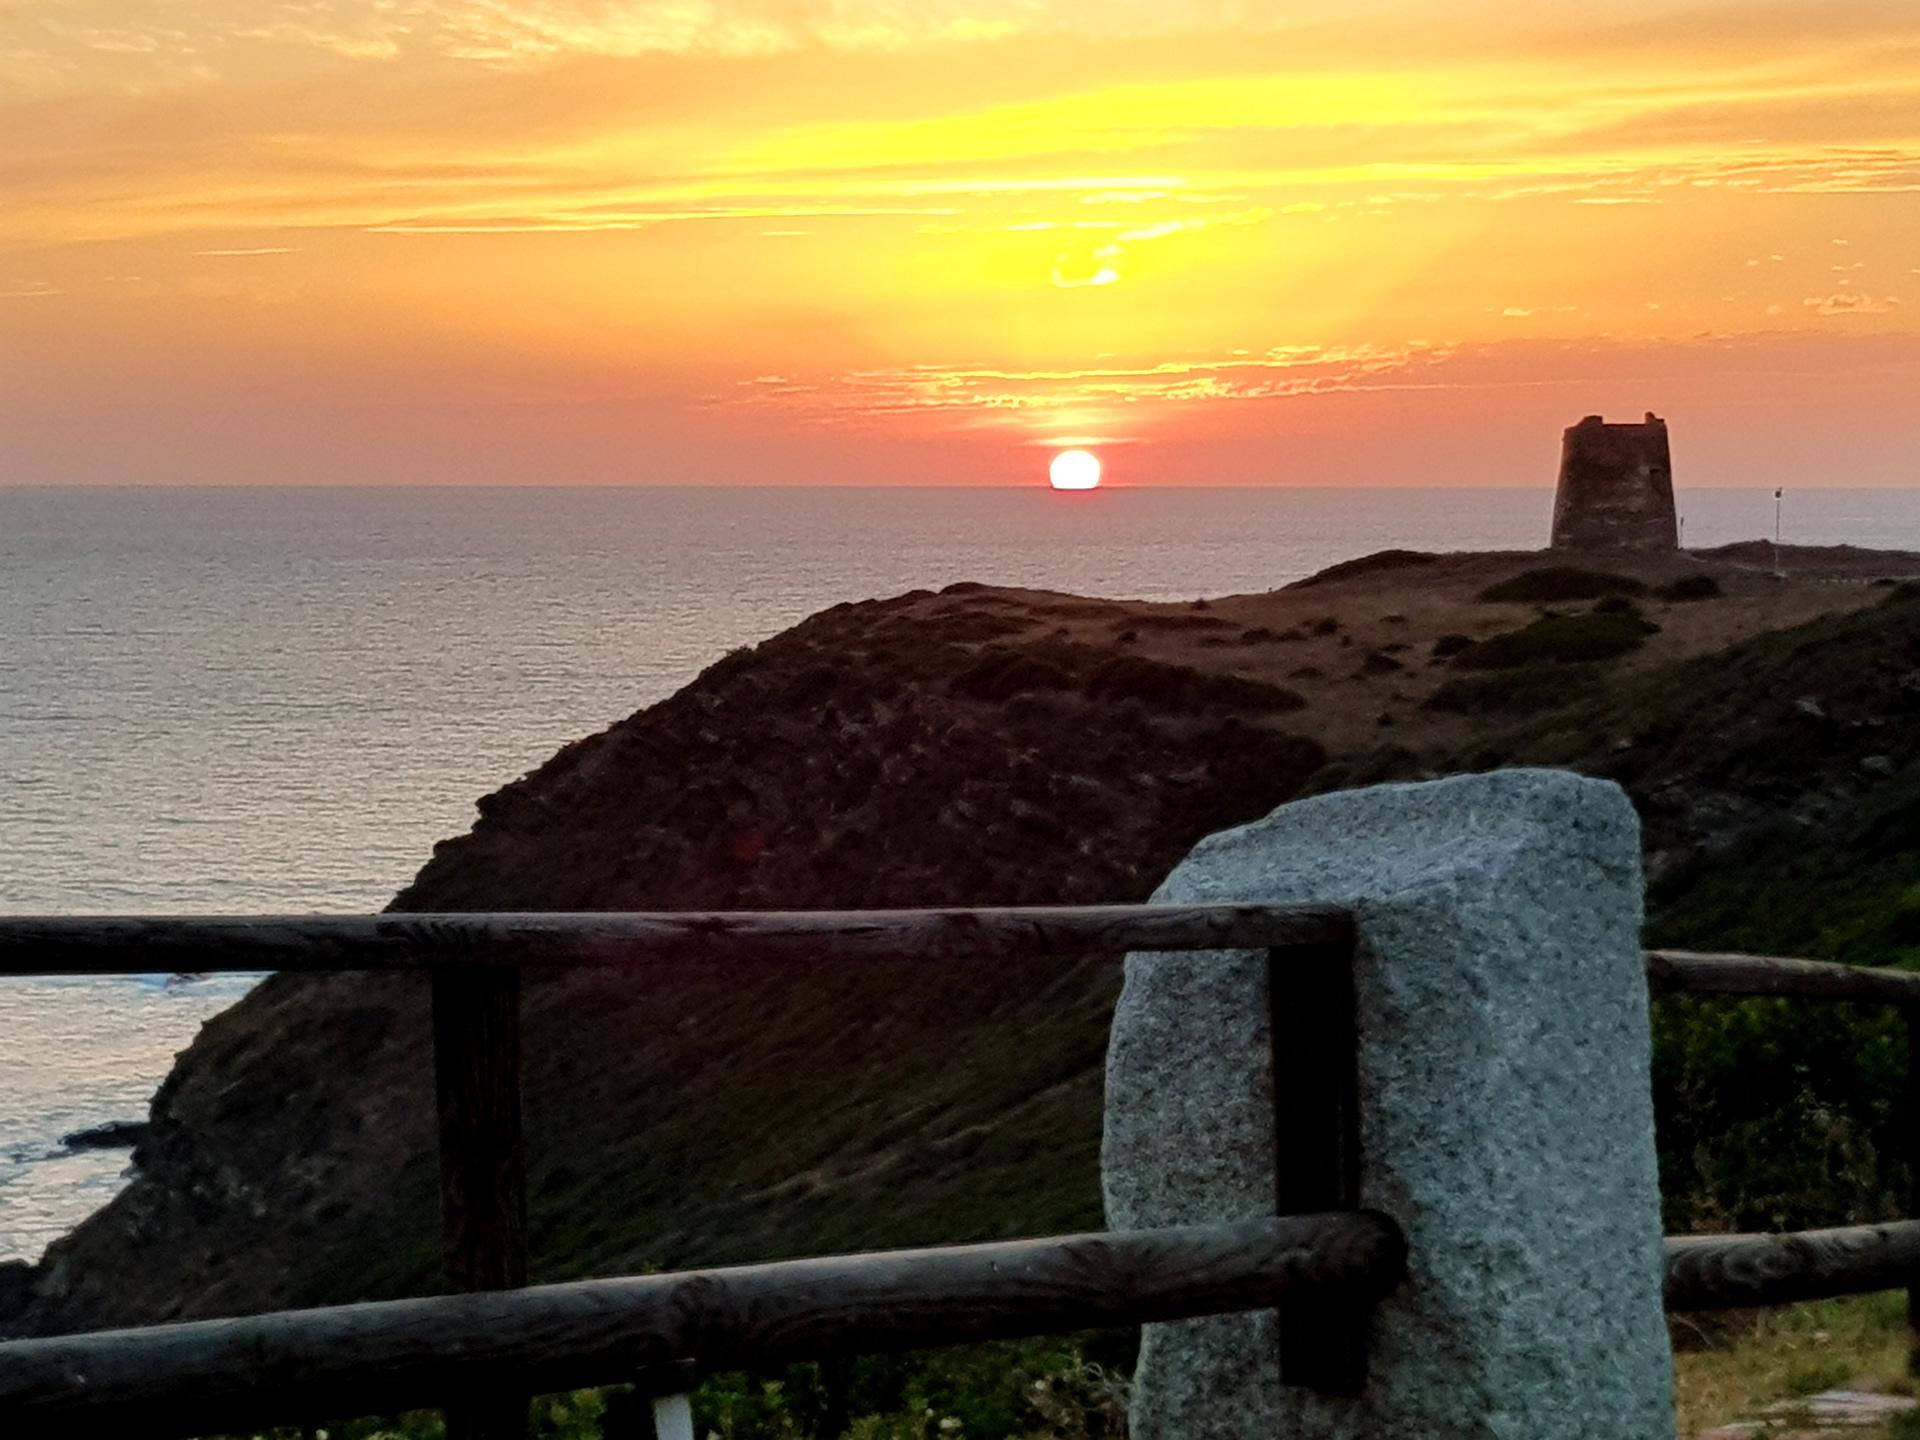 Vacanze a settembre, Sardegna meta ideale!